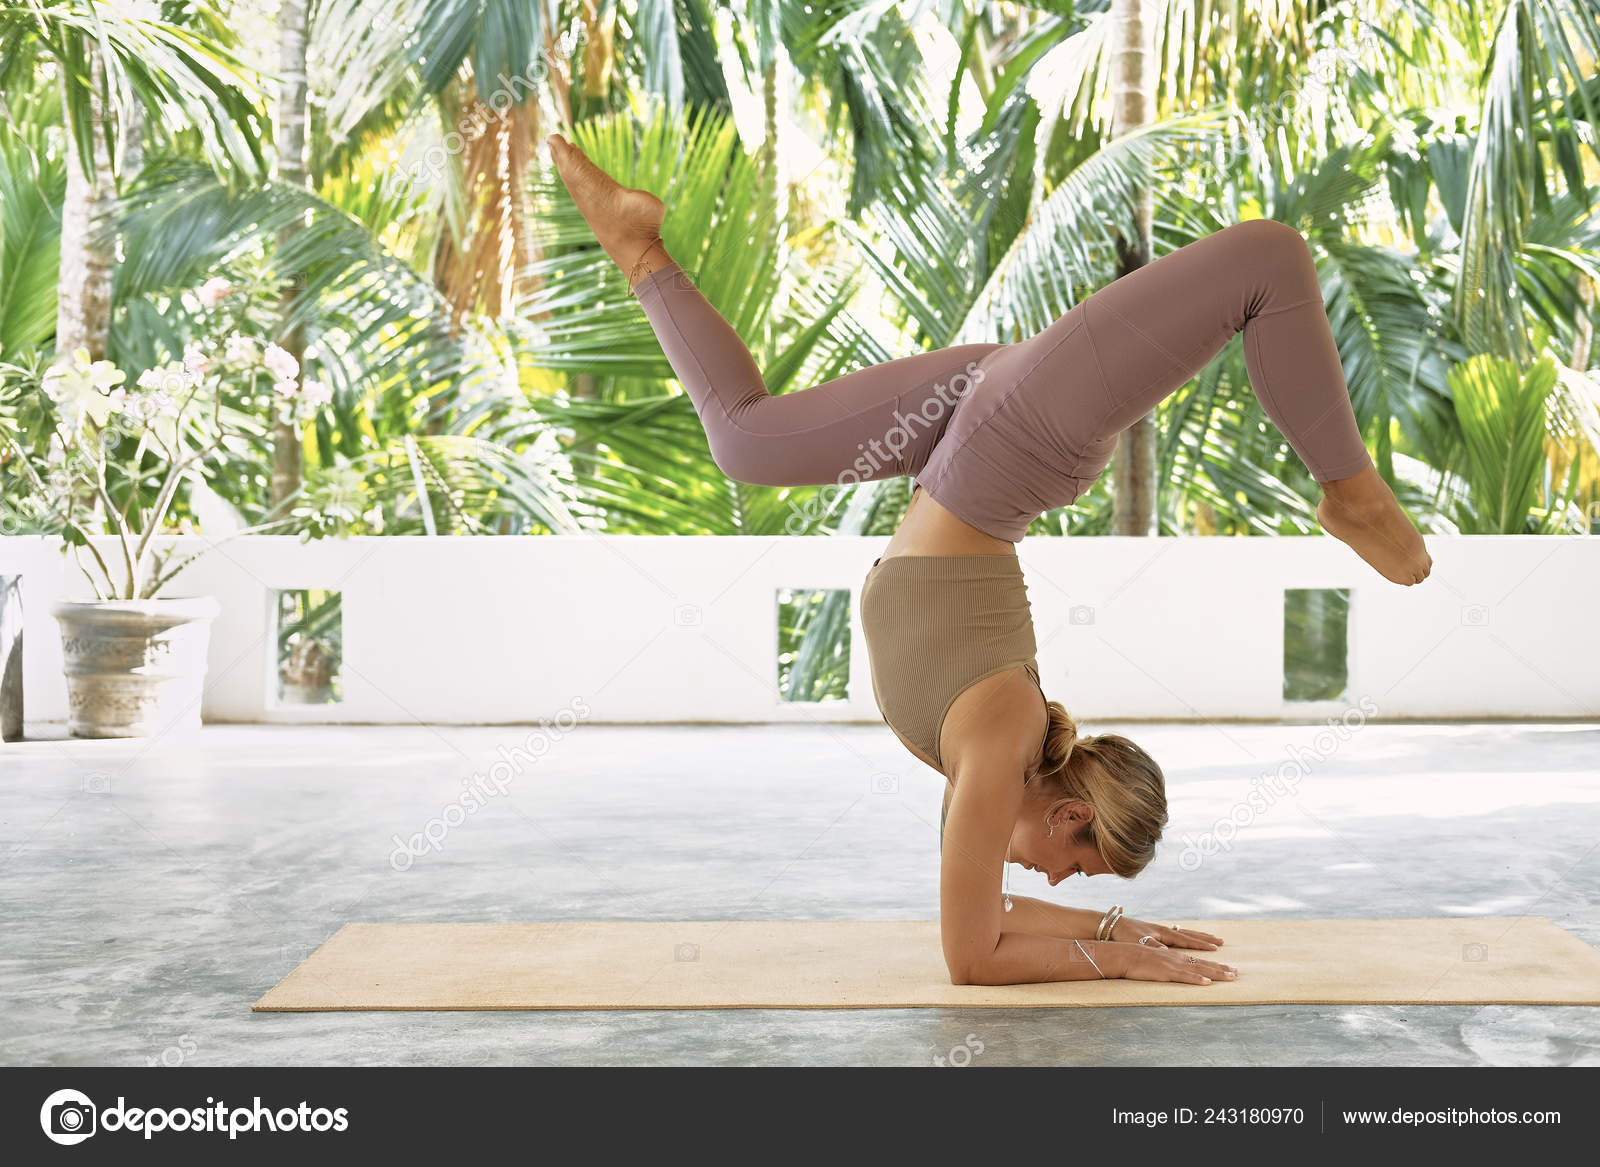 Woman Practicing Advanced Yoga Organic Mat Series Yoga Poses Tropical Stock Photo C Glazunofoto Gmail Com 243180970